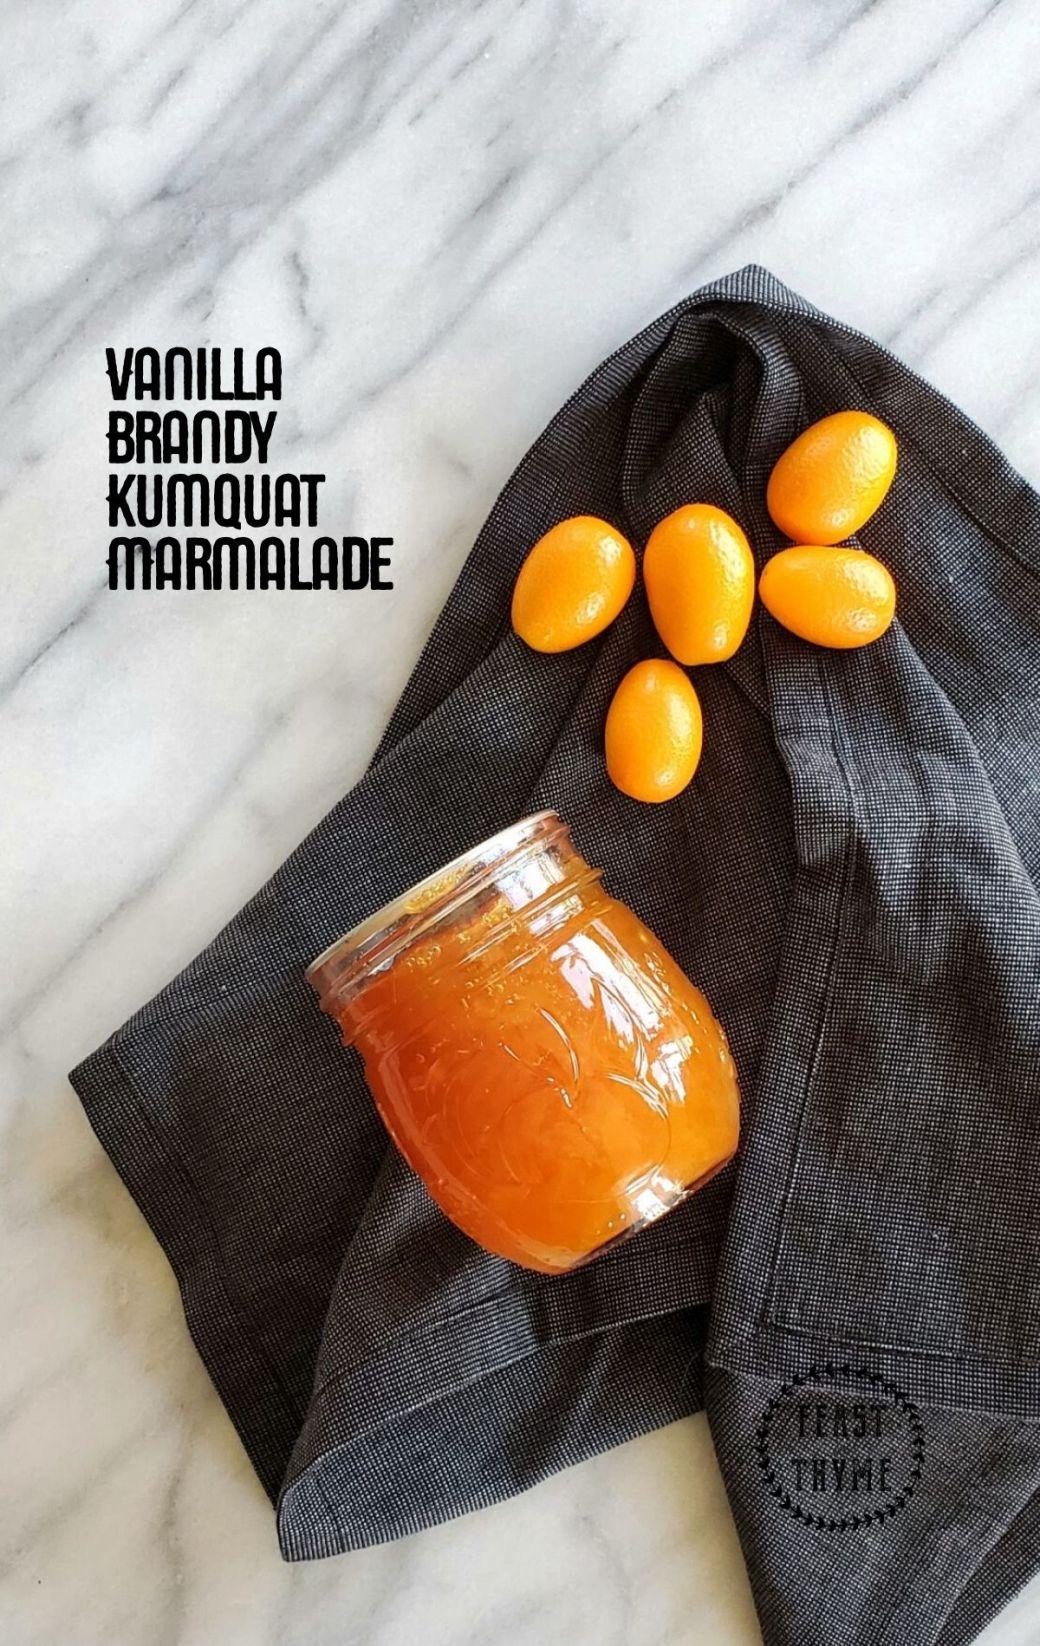 Vanilla Brandy Kumquat Marmalade